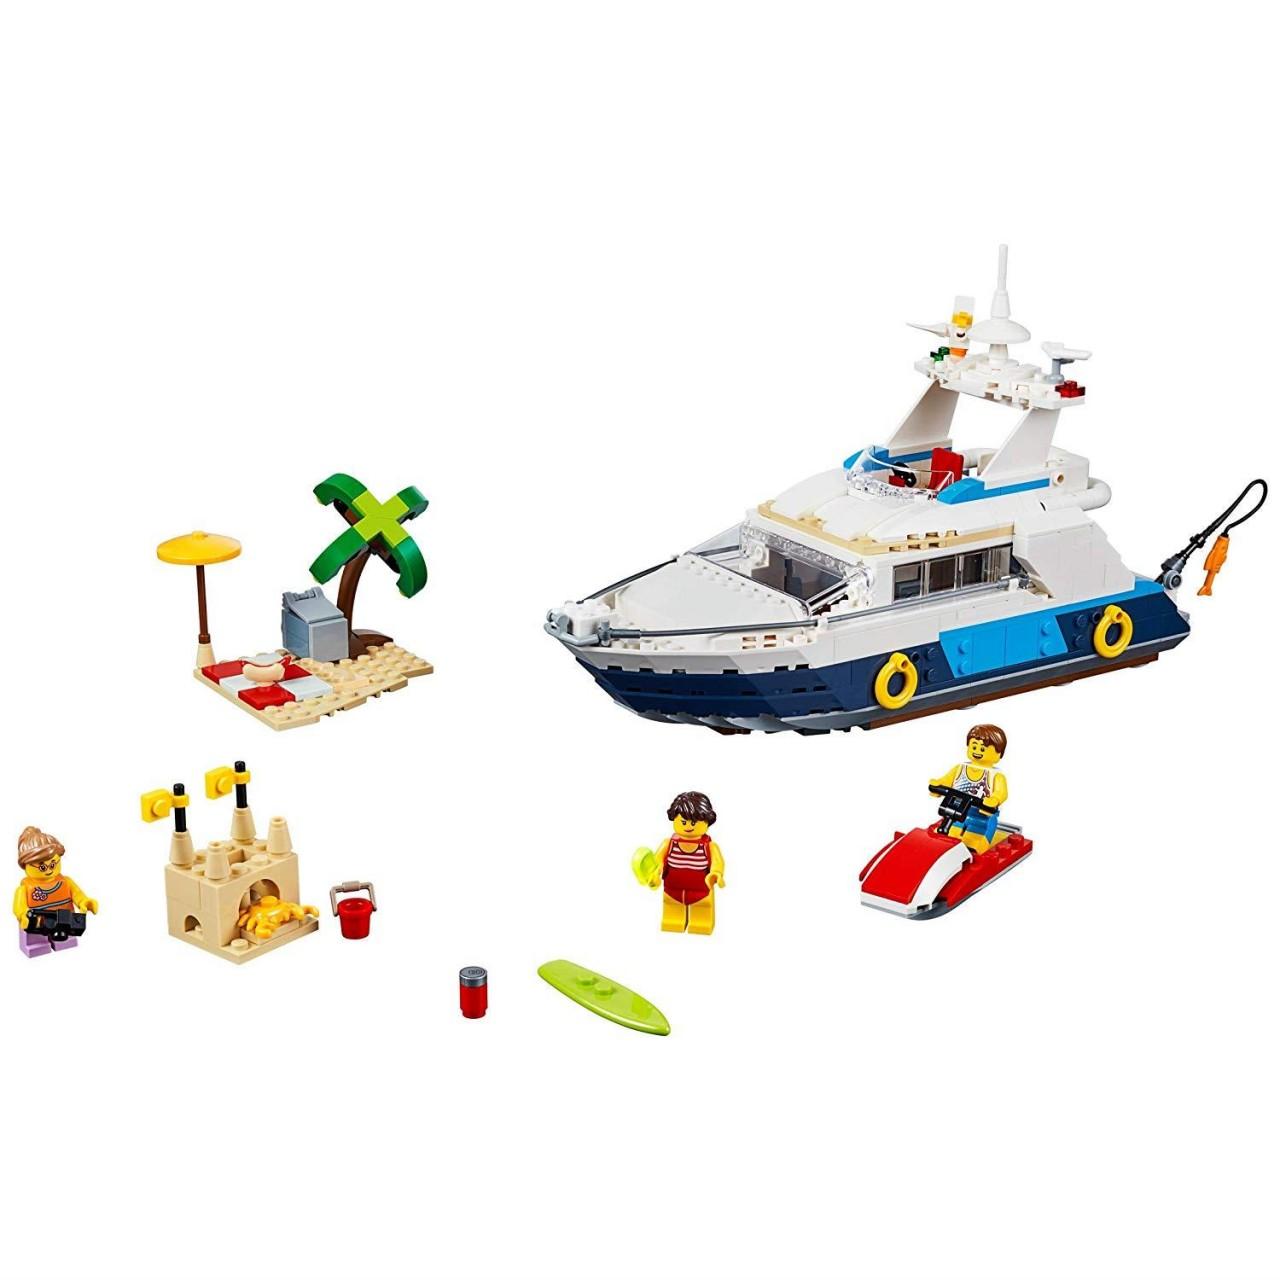 LEGO CREATOR 31083 Abenteuer Yacht